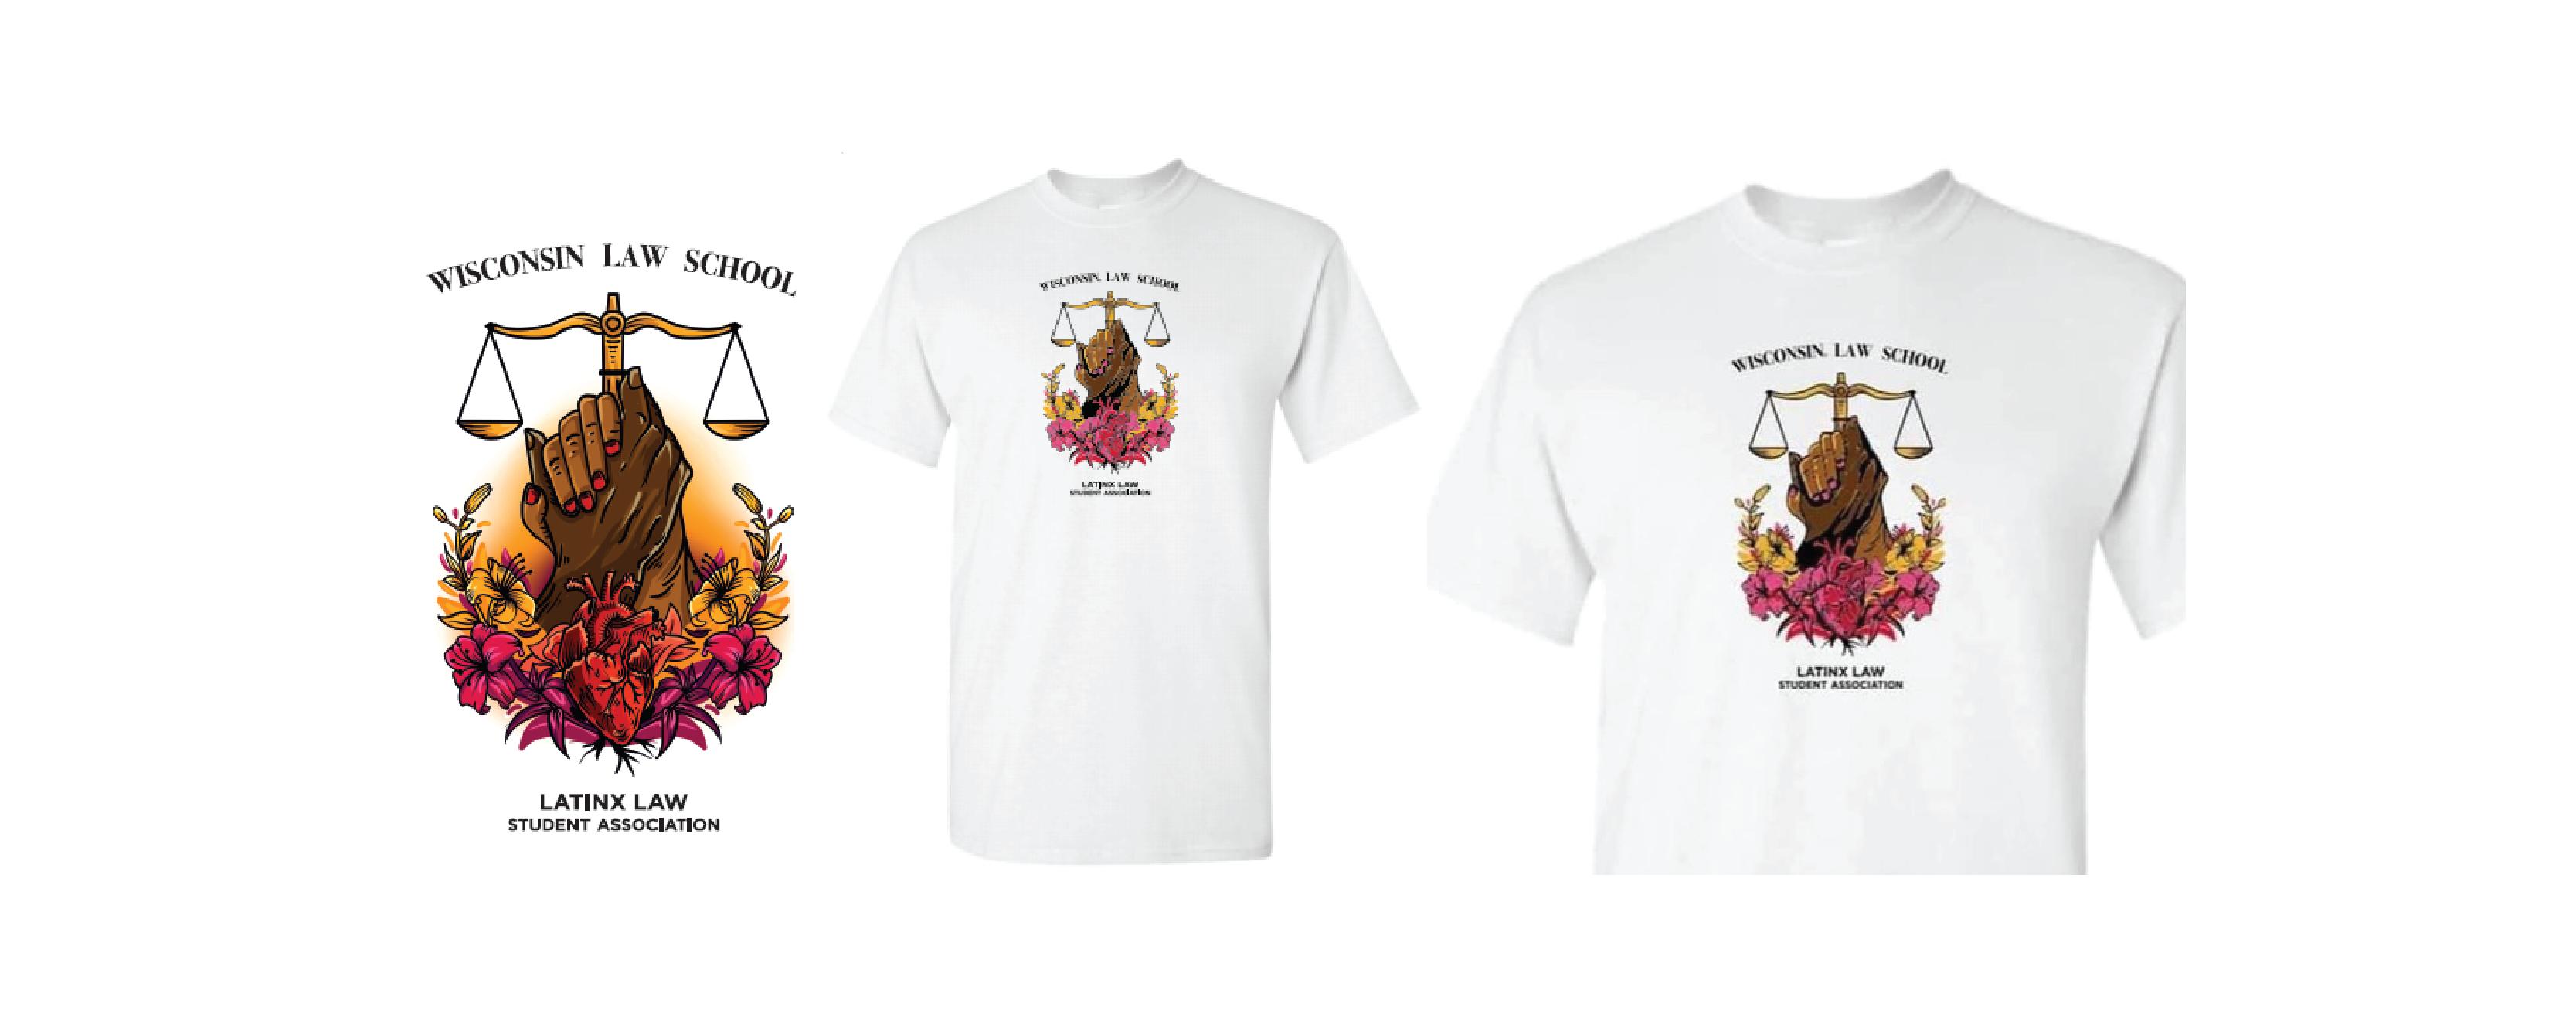 LLSA T-shirt